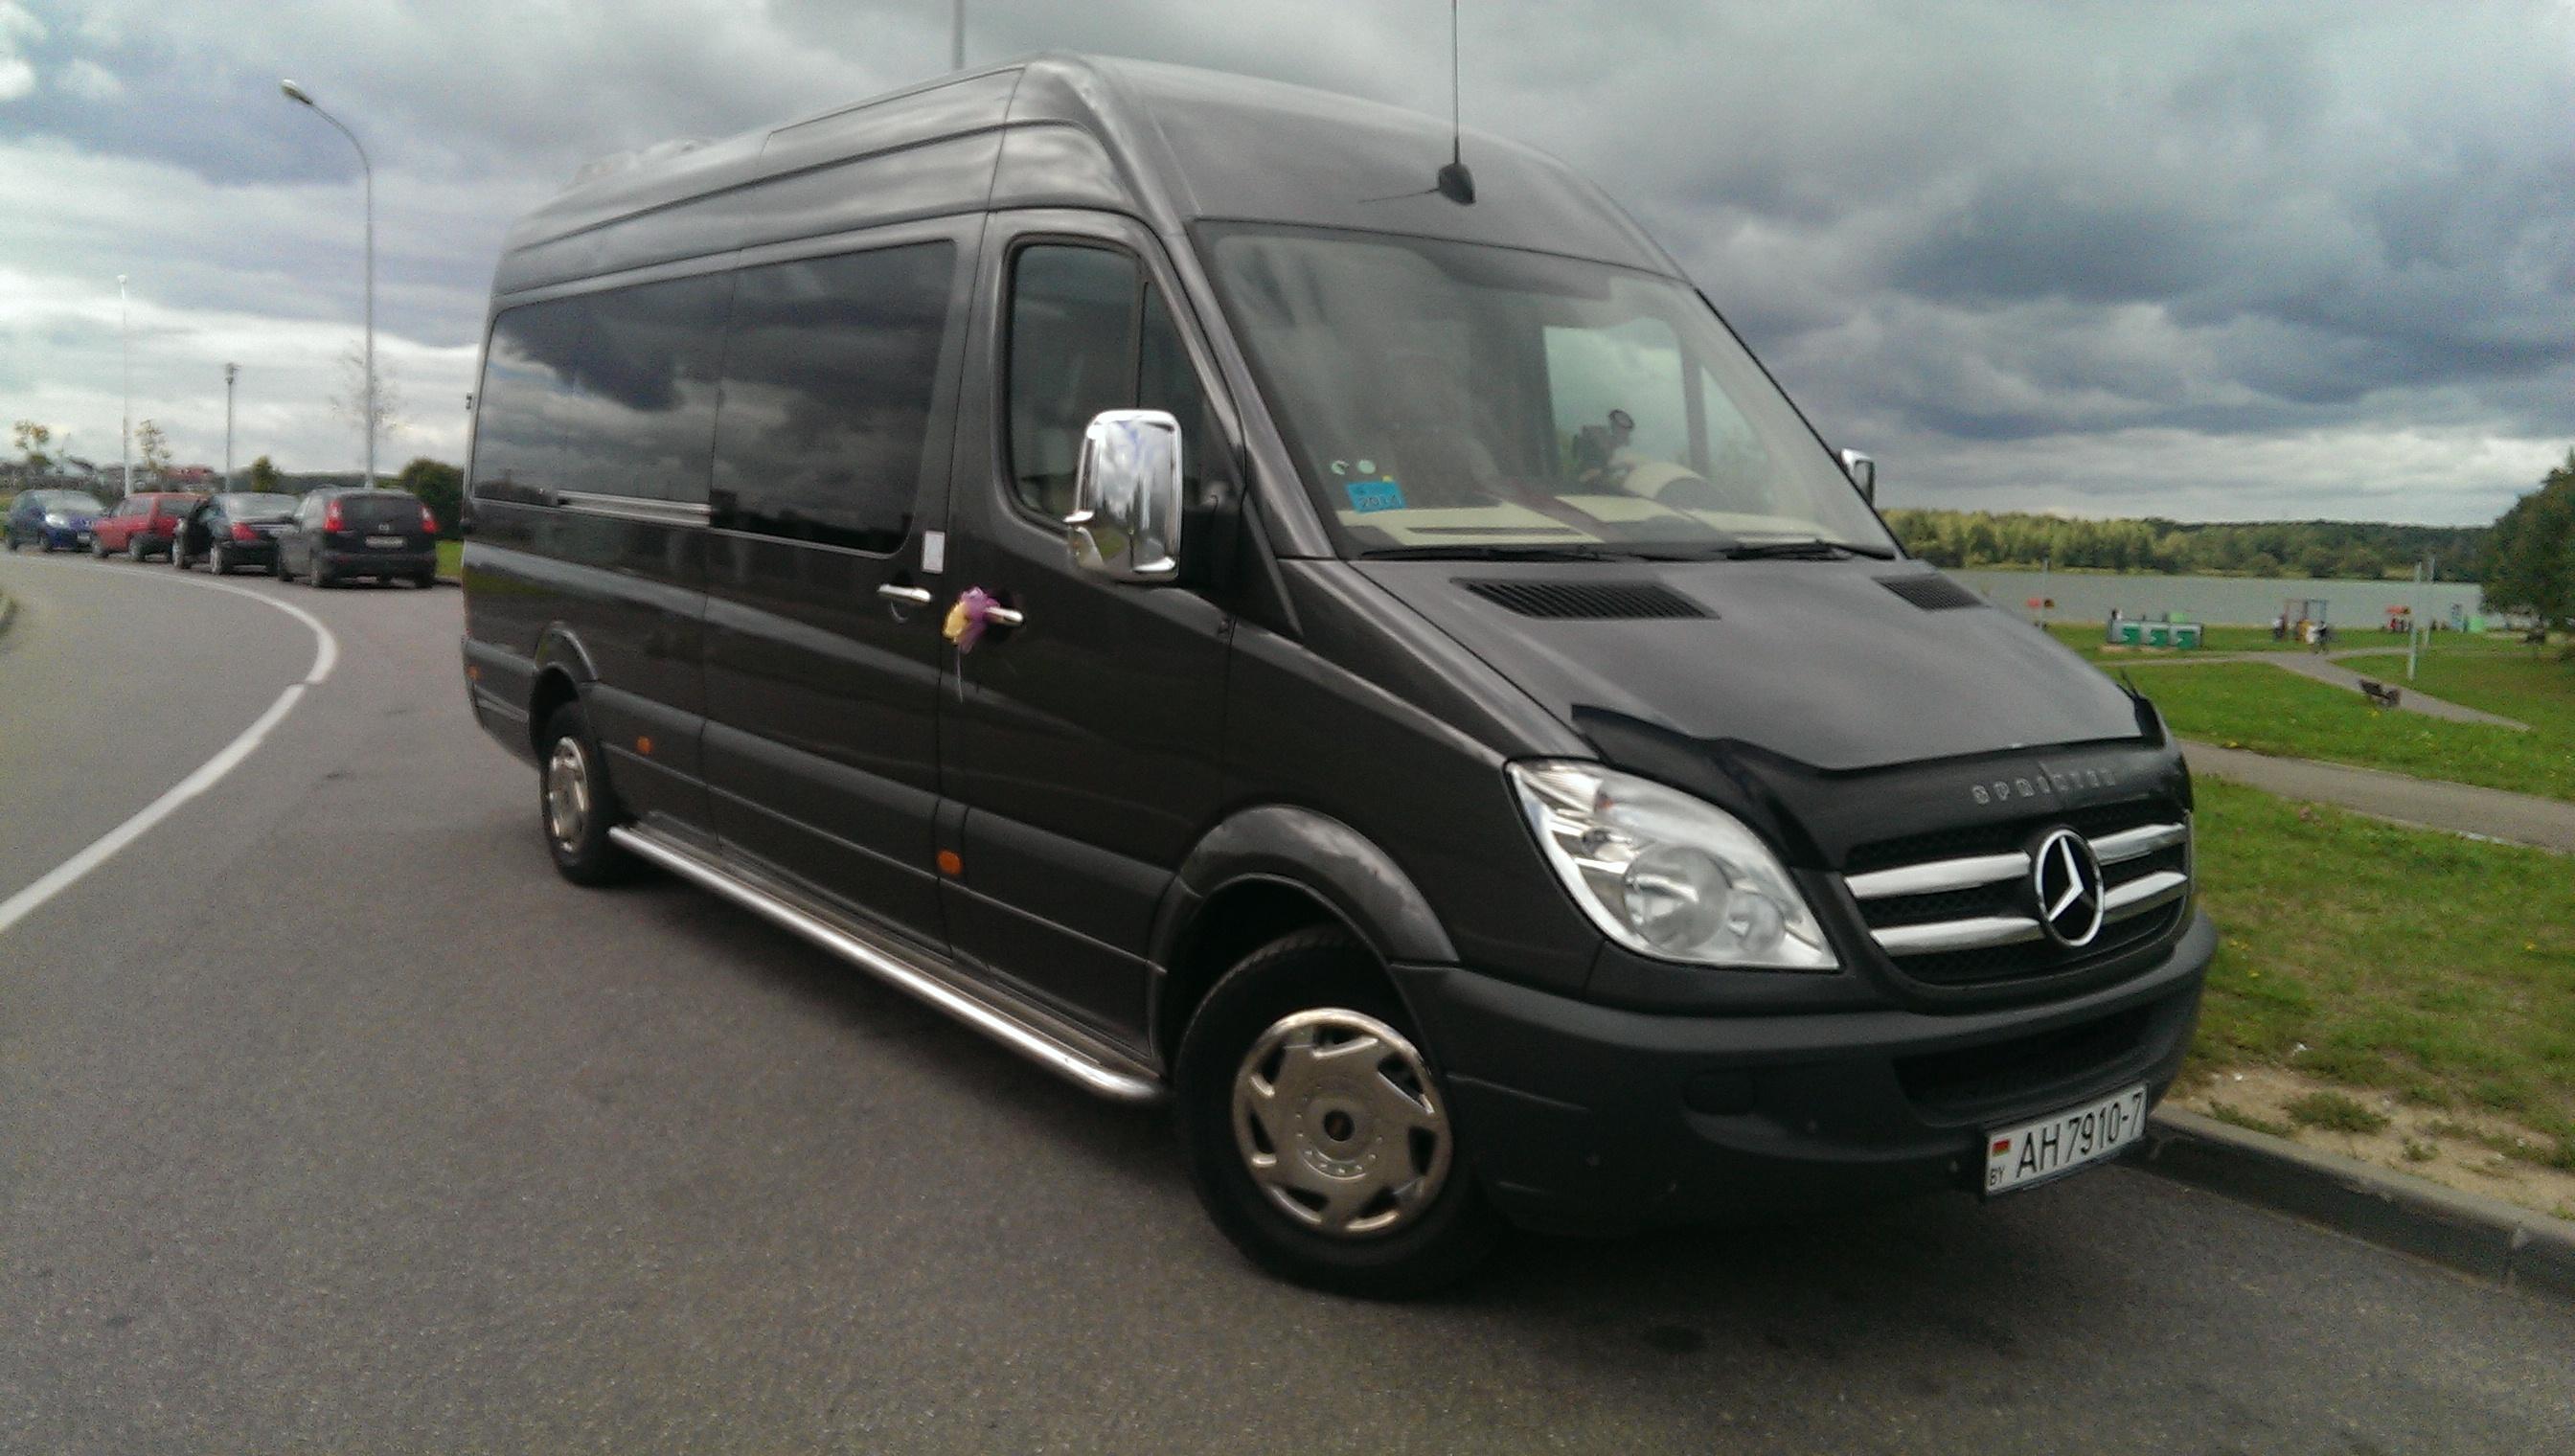 Аренда VIP-микроавтобуса всего от 28,50 руб.